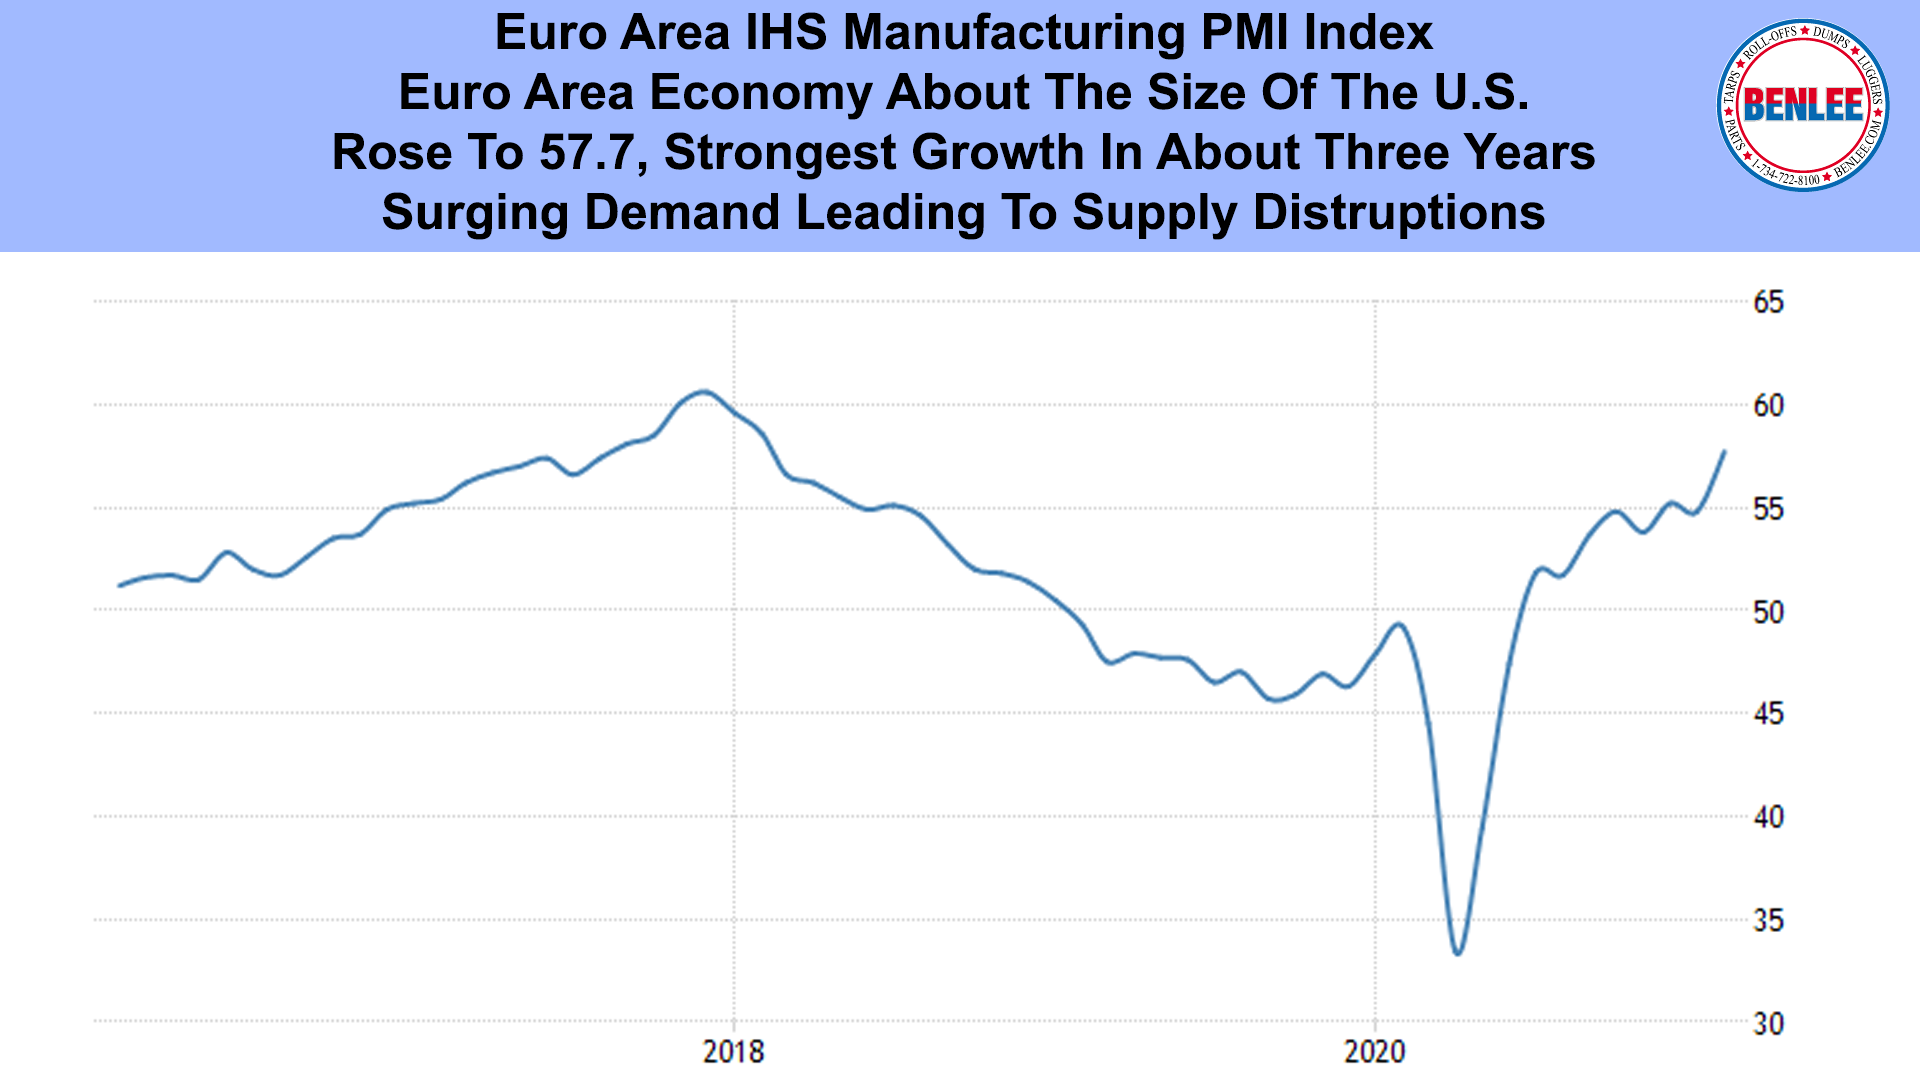 Euro Area IHS Manufacturing PMI Index